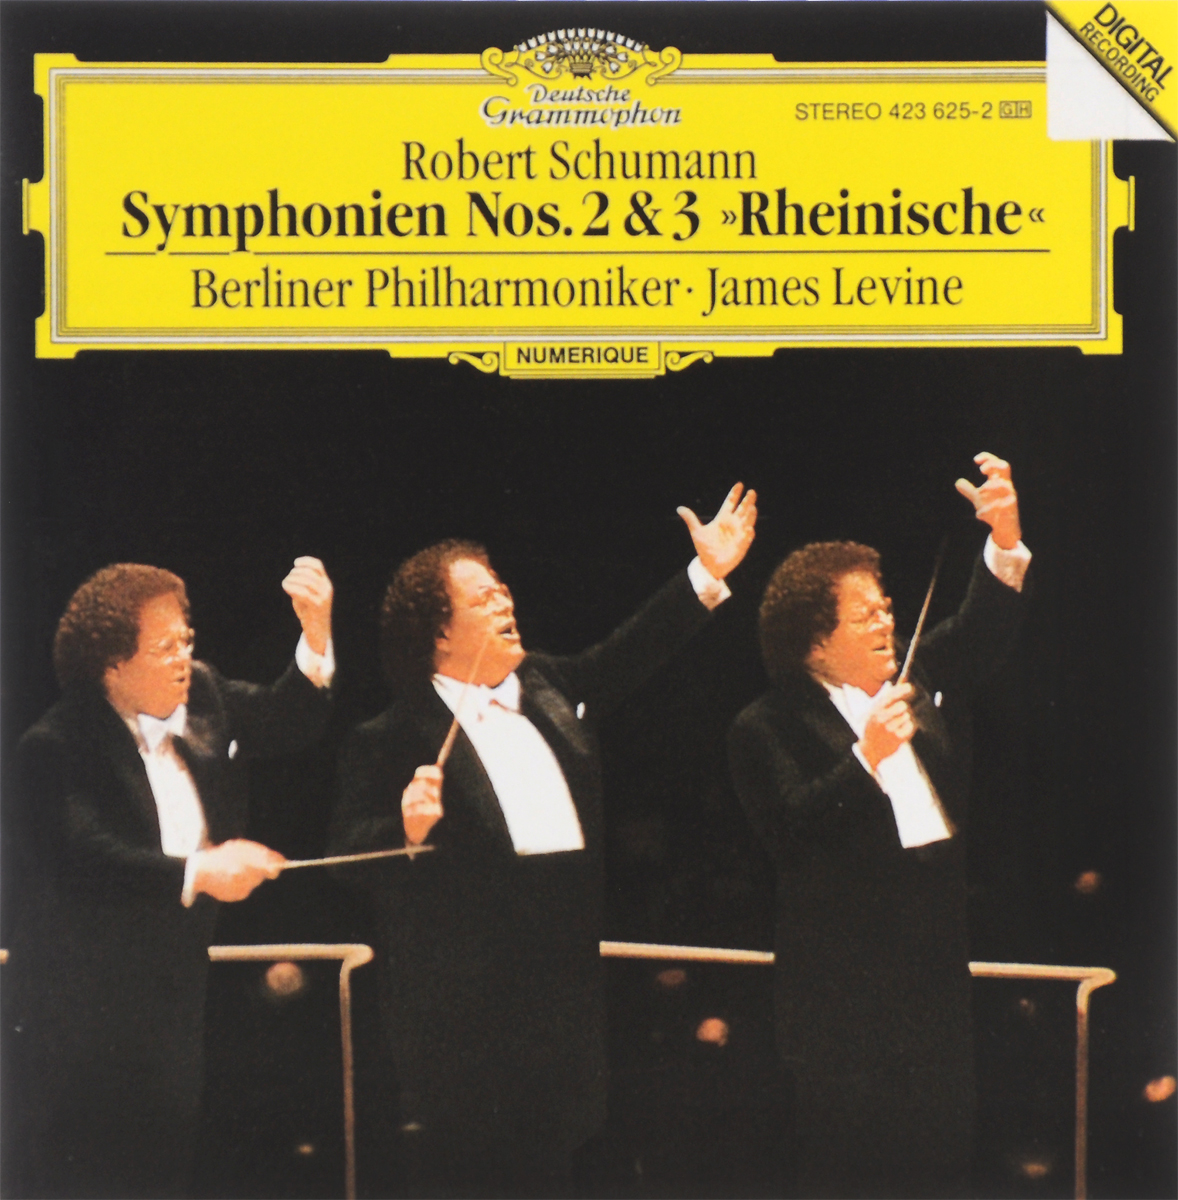 Роберт Шуман Robert Schumann. Symphonies Nos. 2 & 3 Rheinische роберт плант robert plant manic nirvana